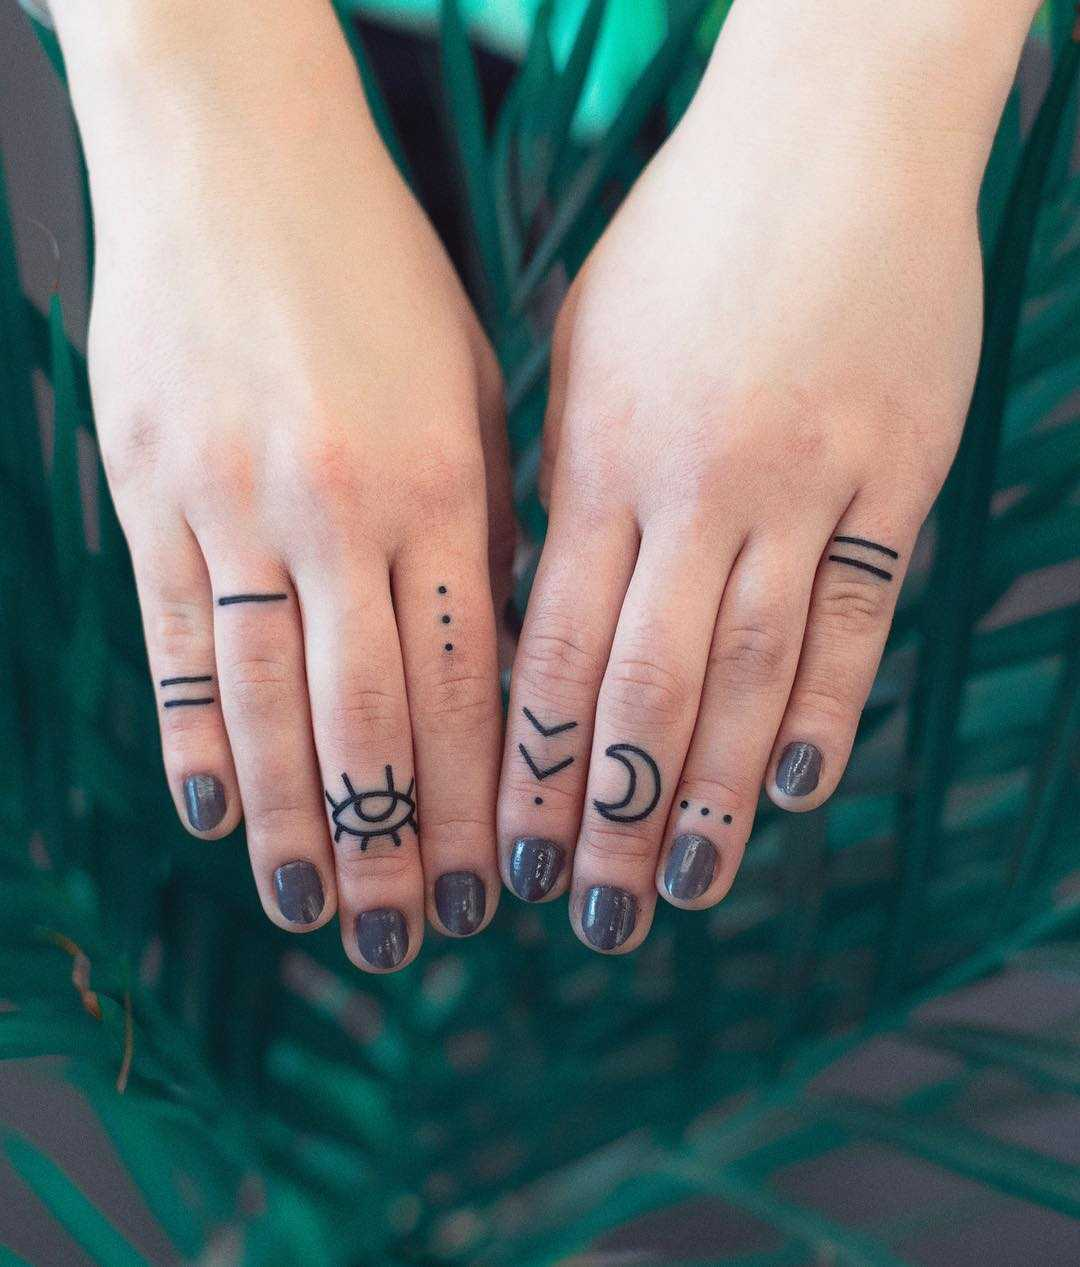 Minimalist finger tattoos by Dżudi Bazgrole